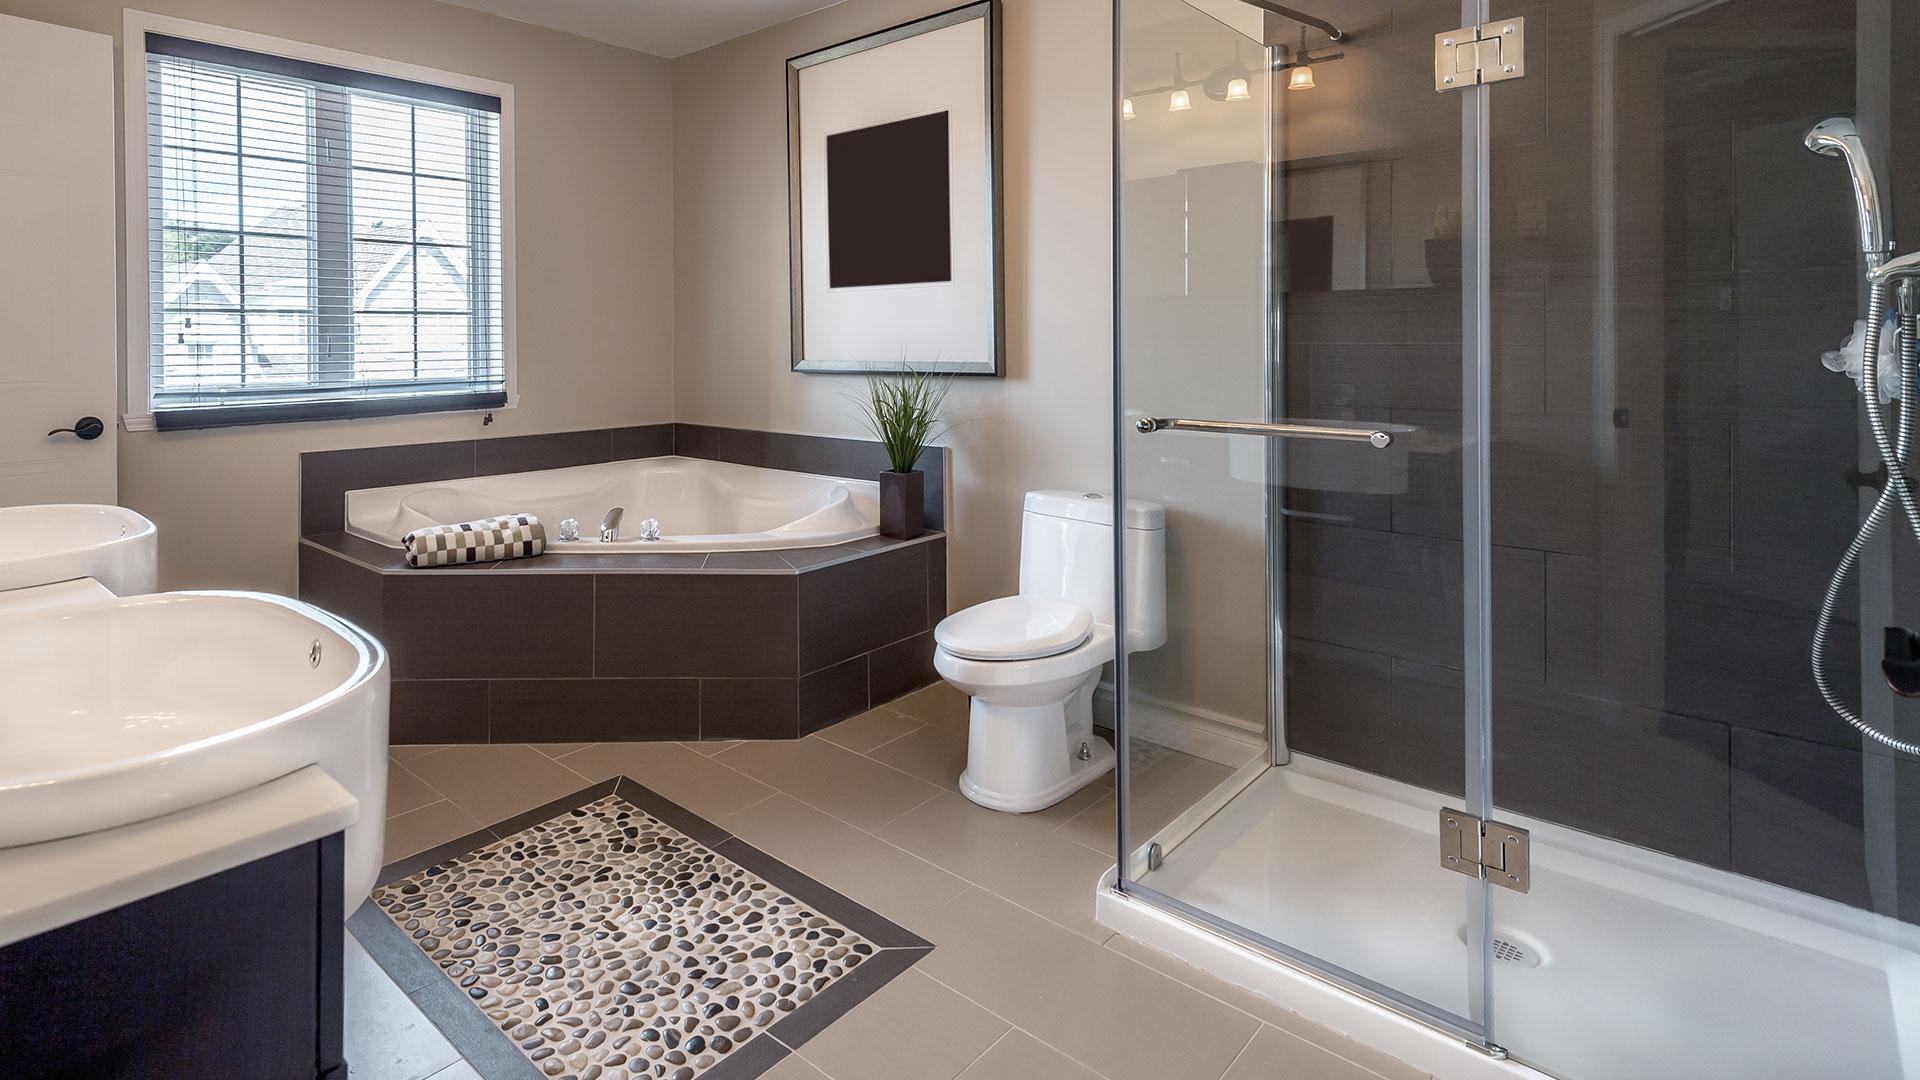 boise decobizz bathroom ideas com remodel